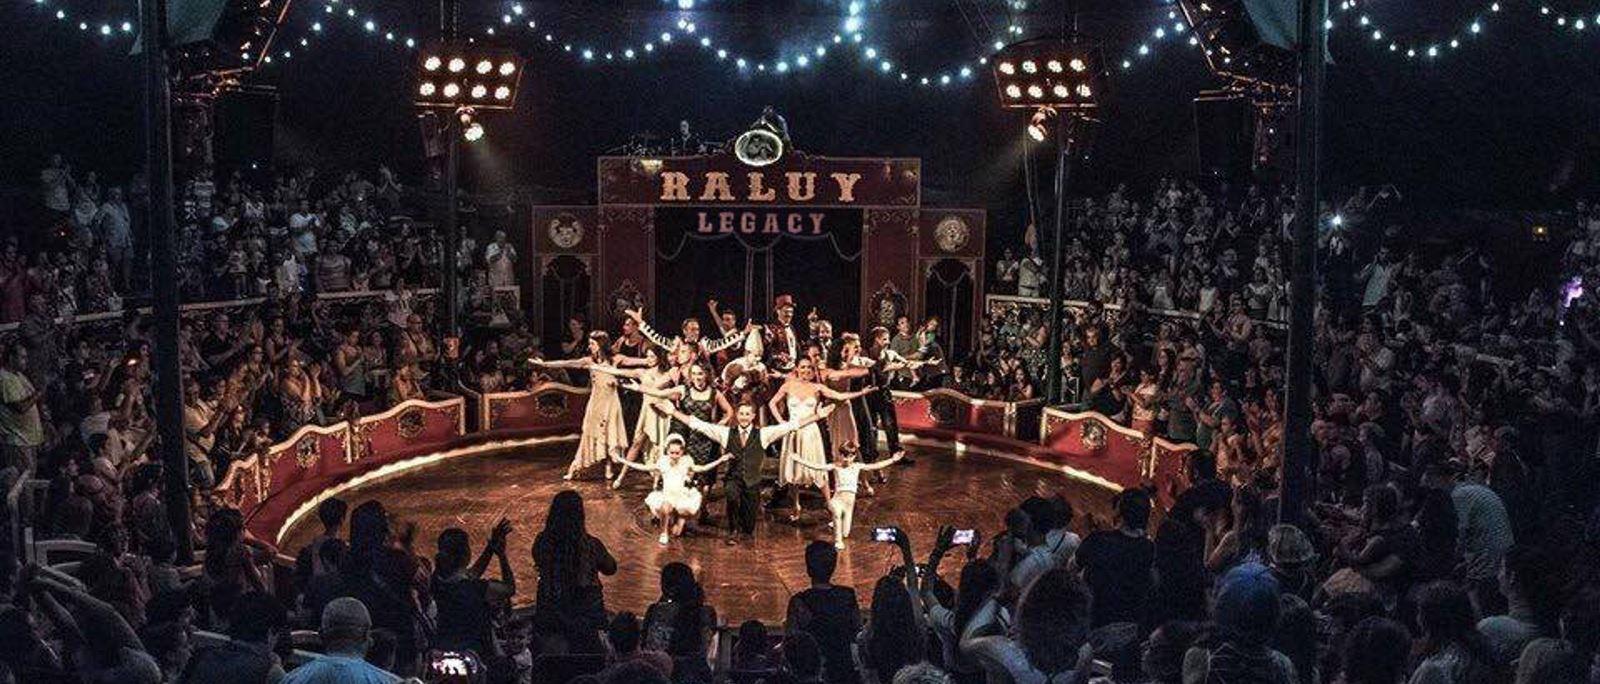 Circo Raluy Legacy Final 2017